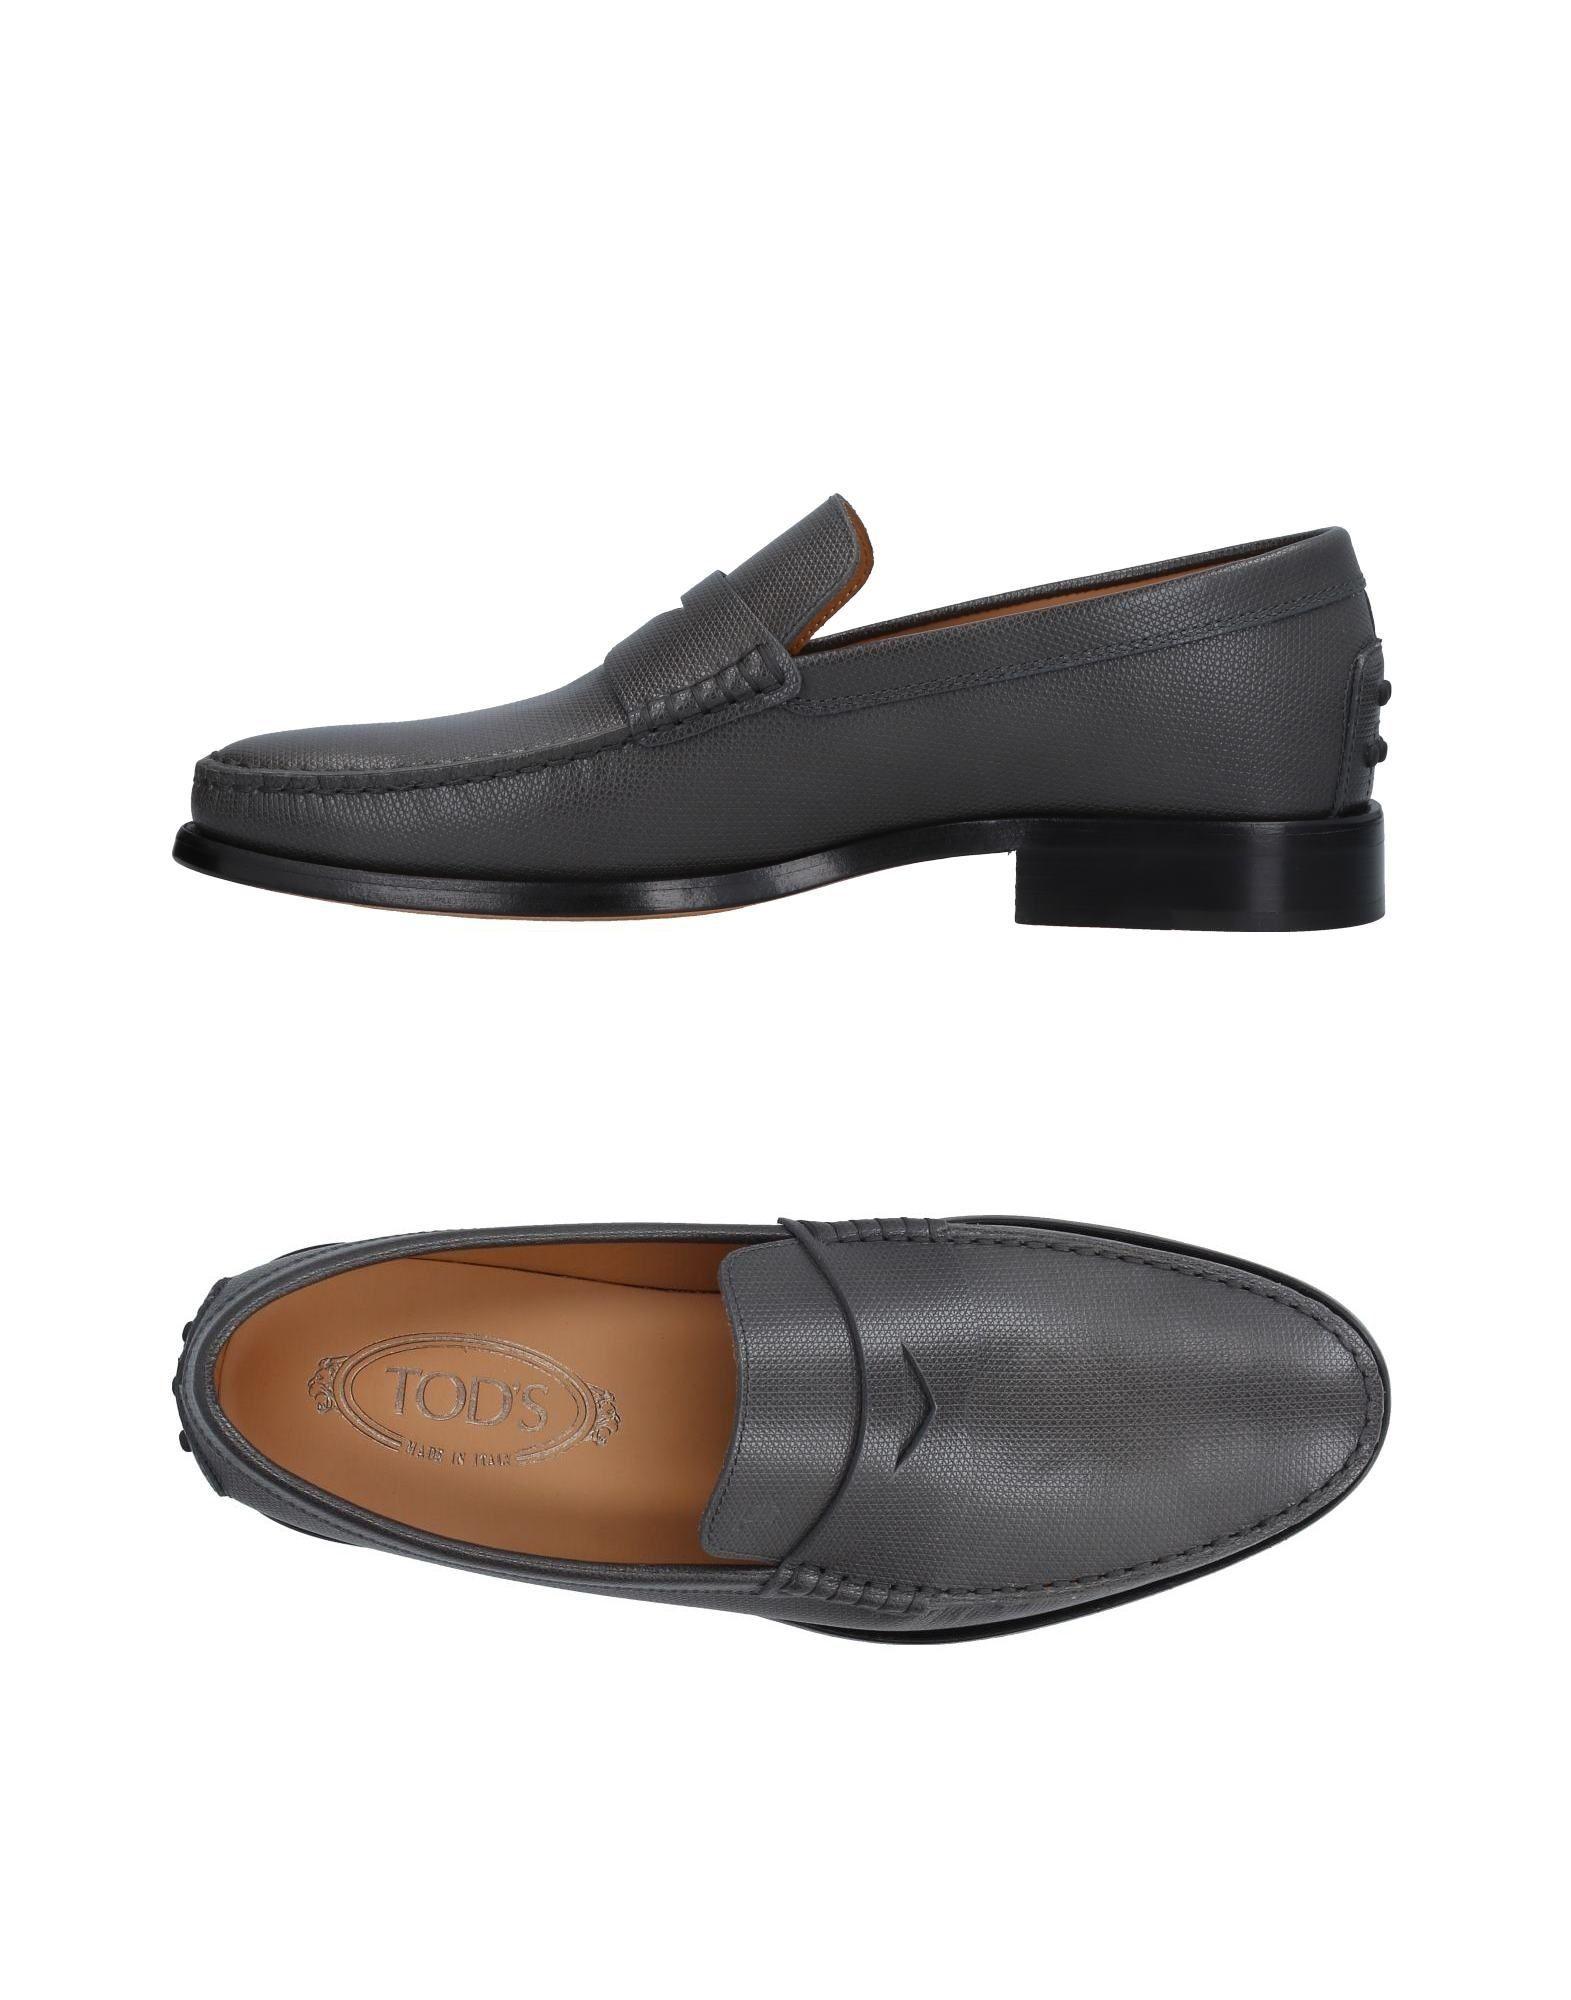 Tod's Mokassins Herren  11412473KI Gute Qualität beliebte Schuhe